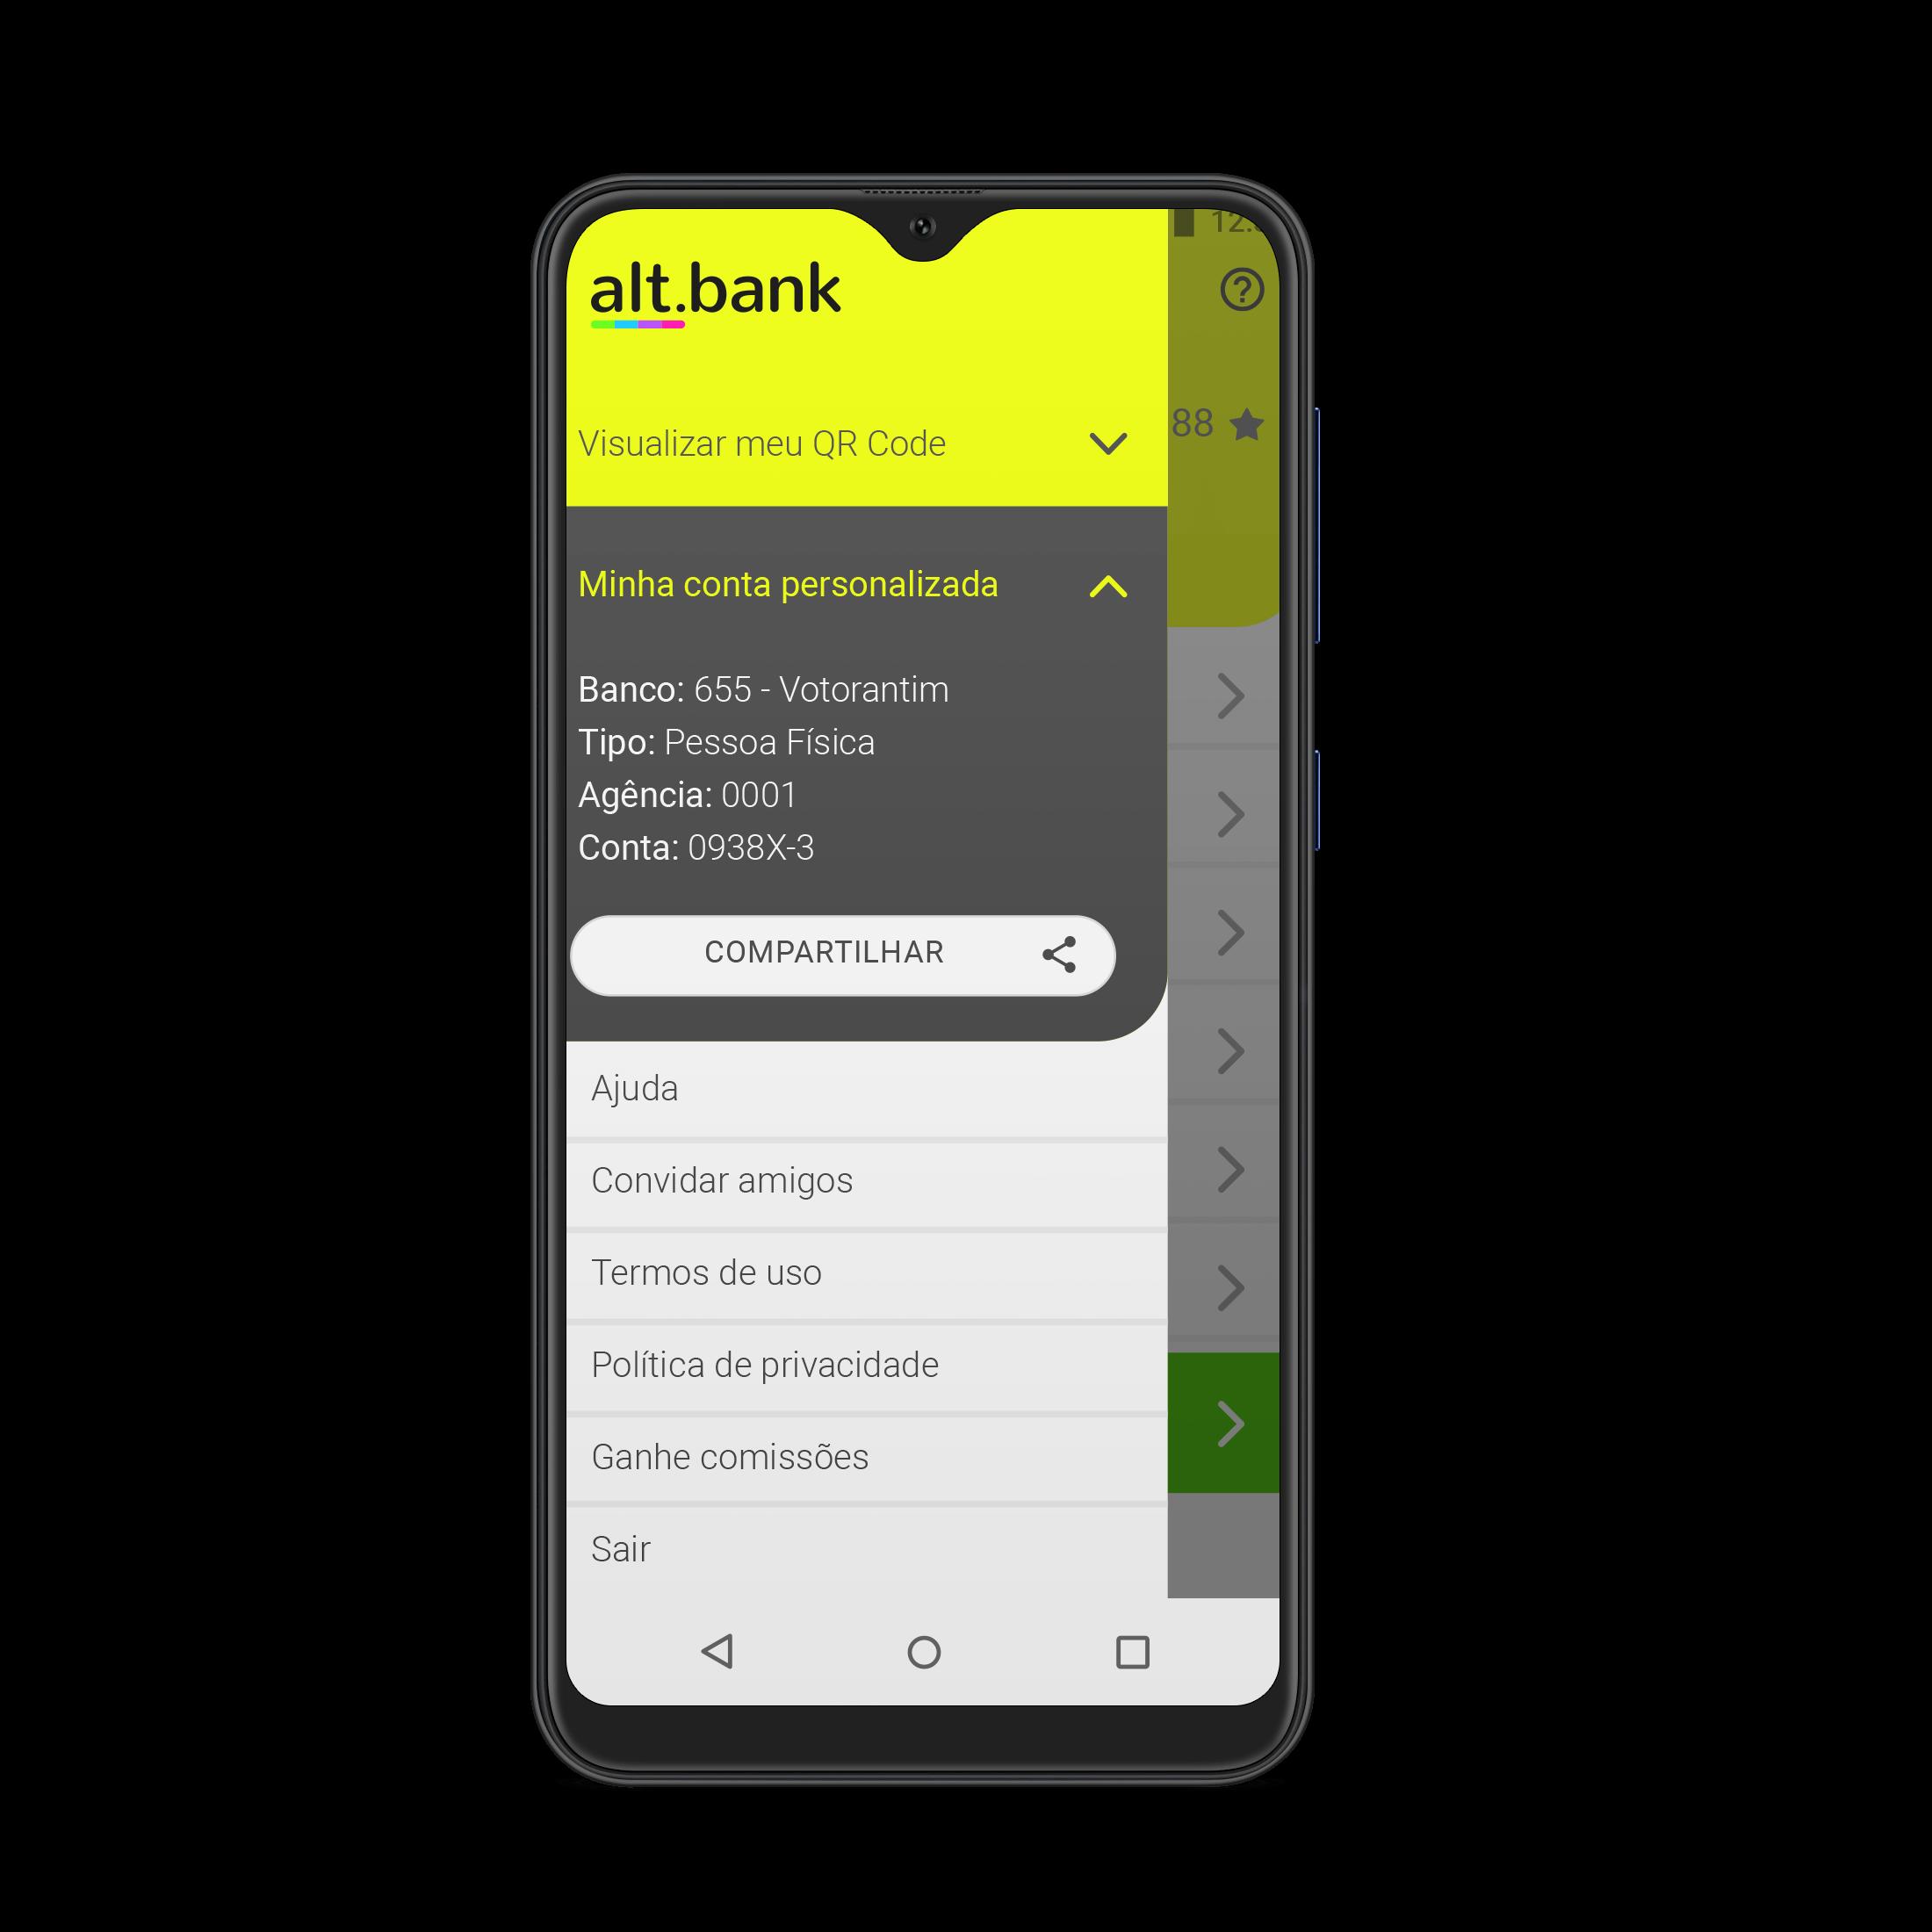 smartphone com aplicativo altbank aberto